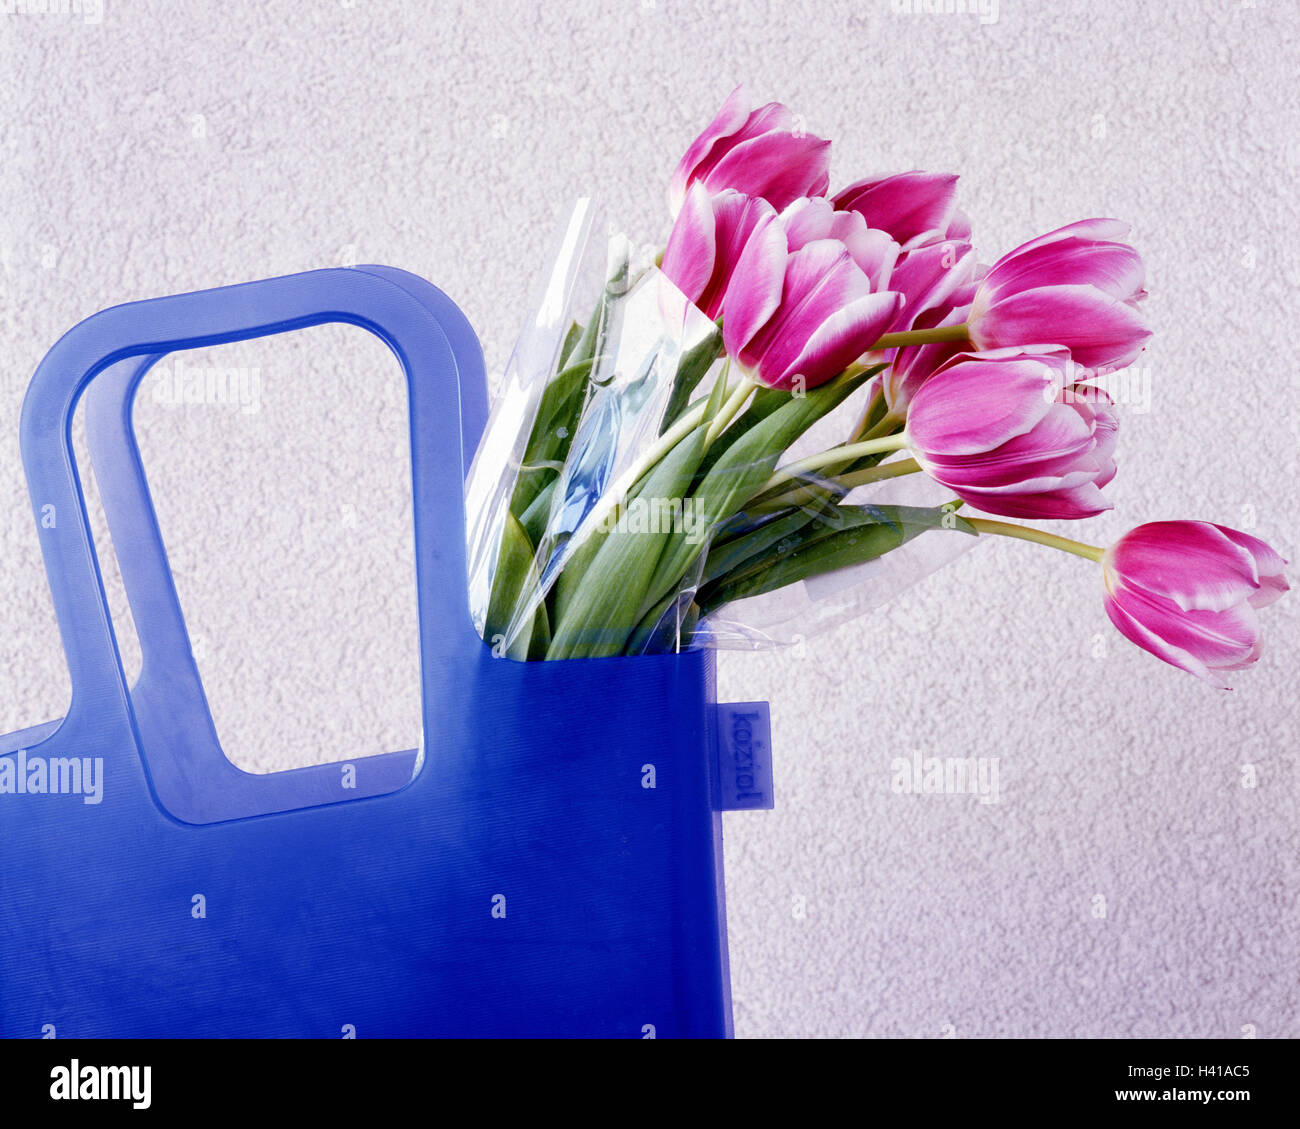 Berömda Shopping bag, flower bouquet, tulips only editorially! Concept GC-66